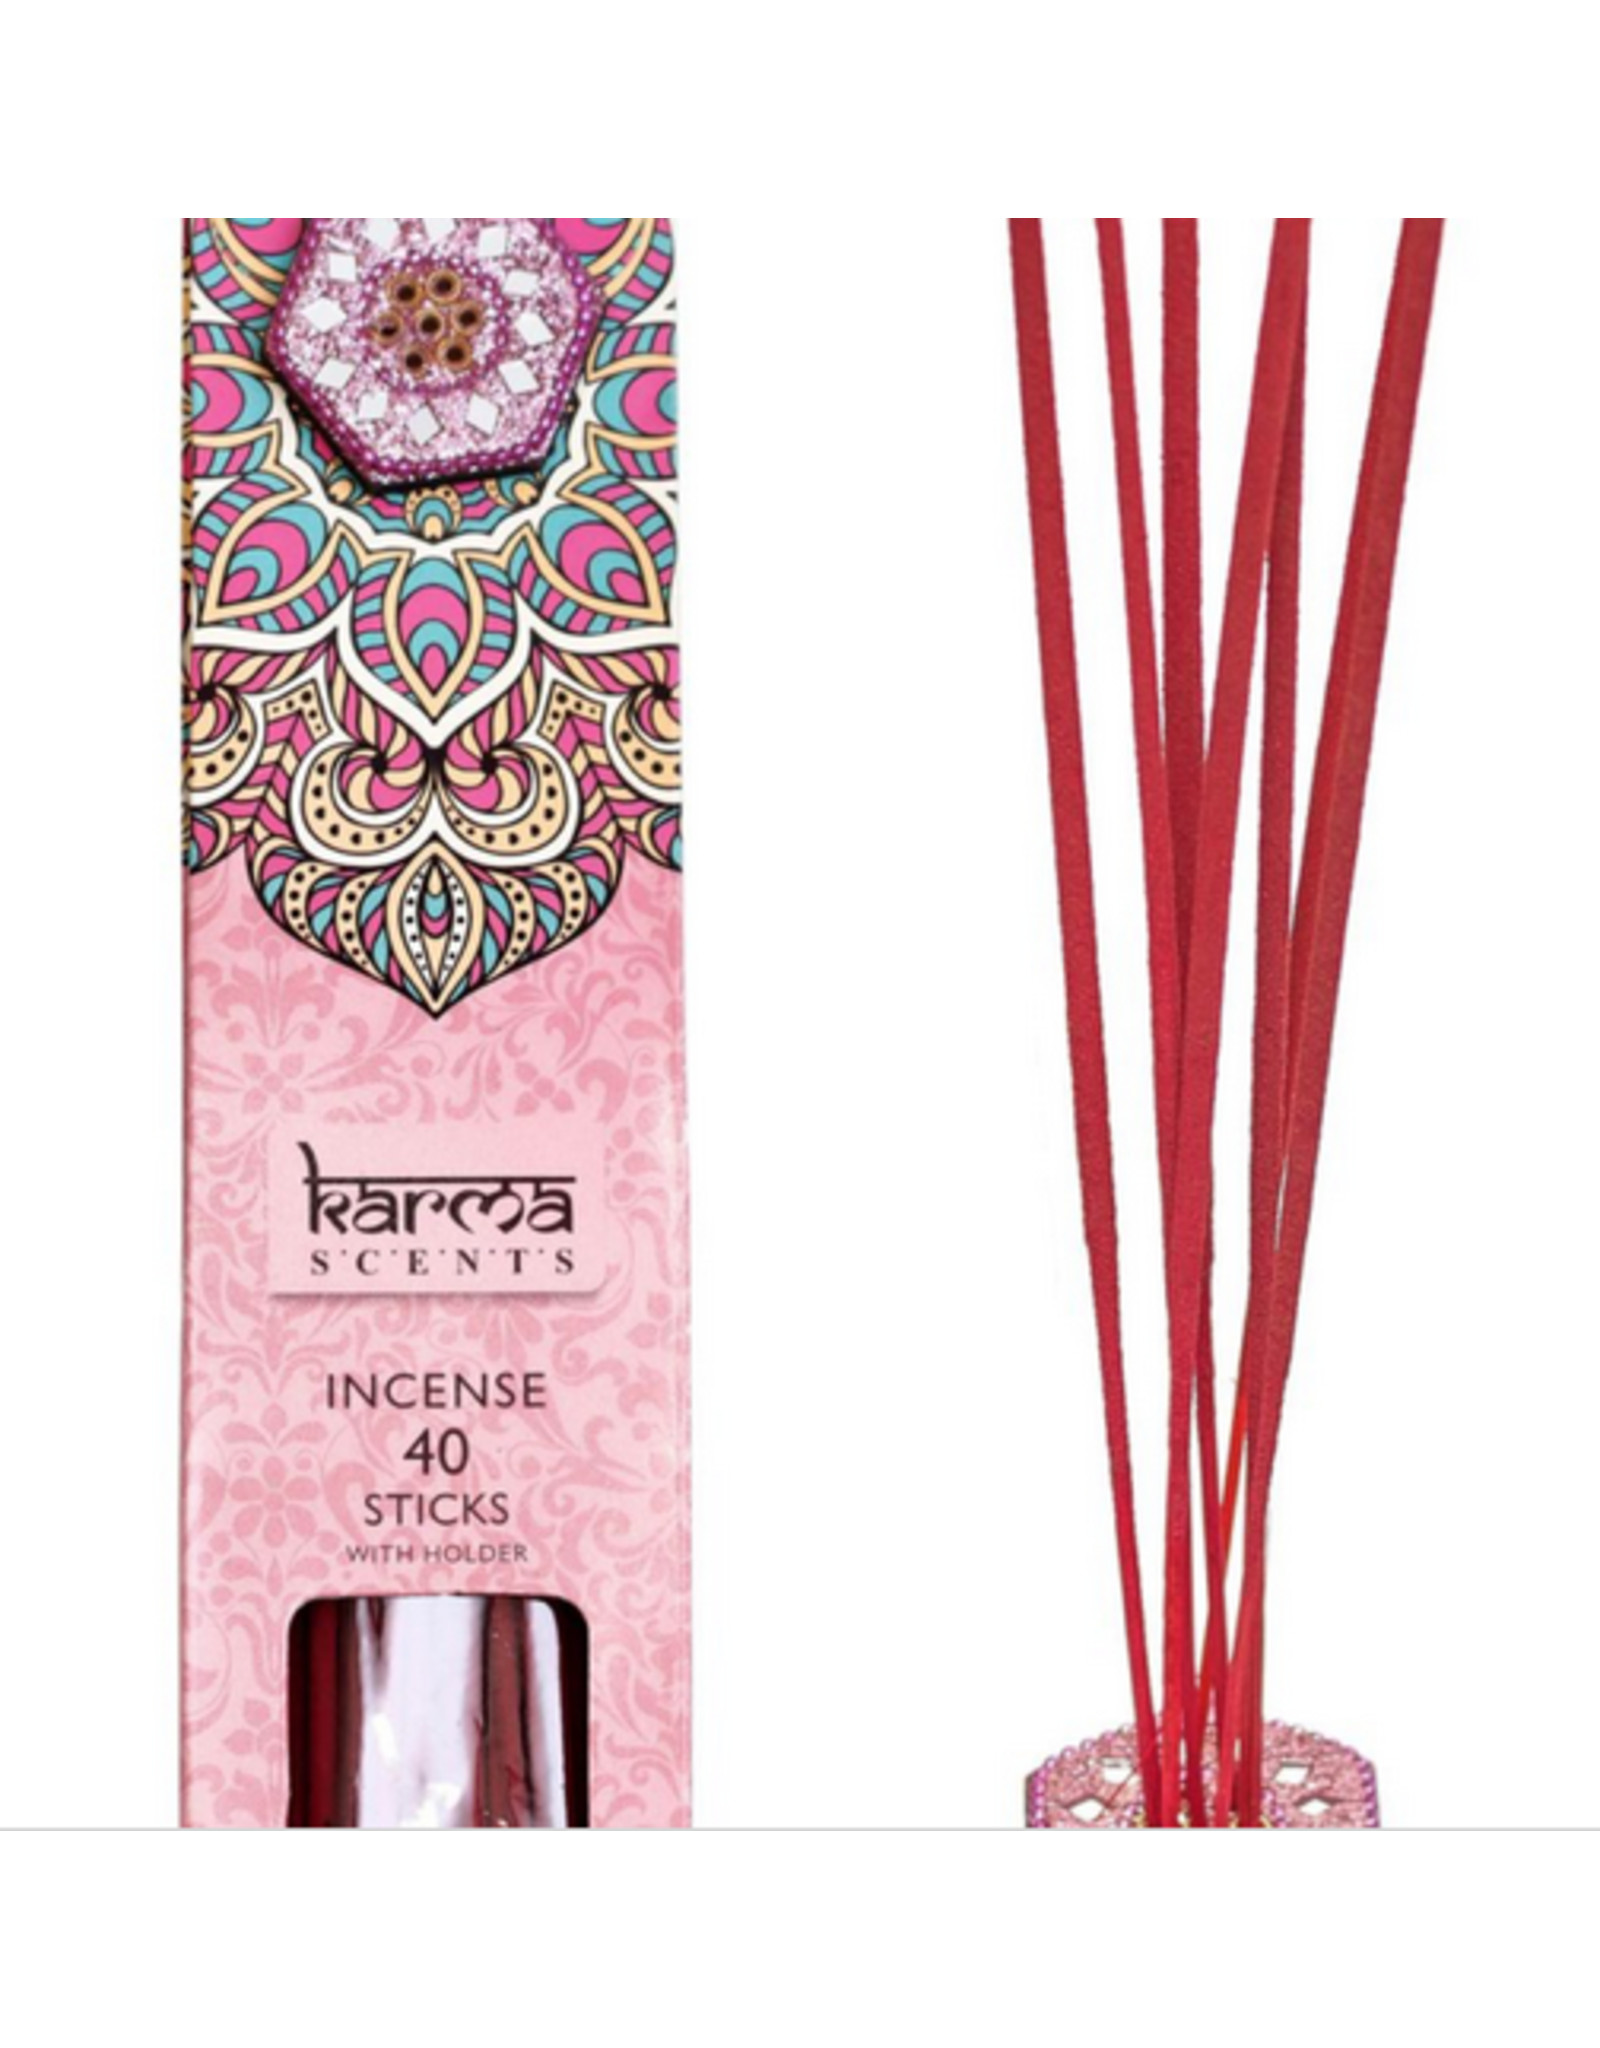 Karma Scents 40 Sticks with Jeweled Incense Holder Rose